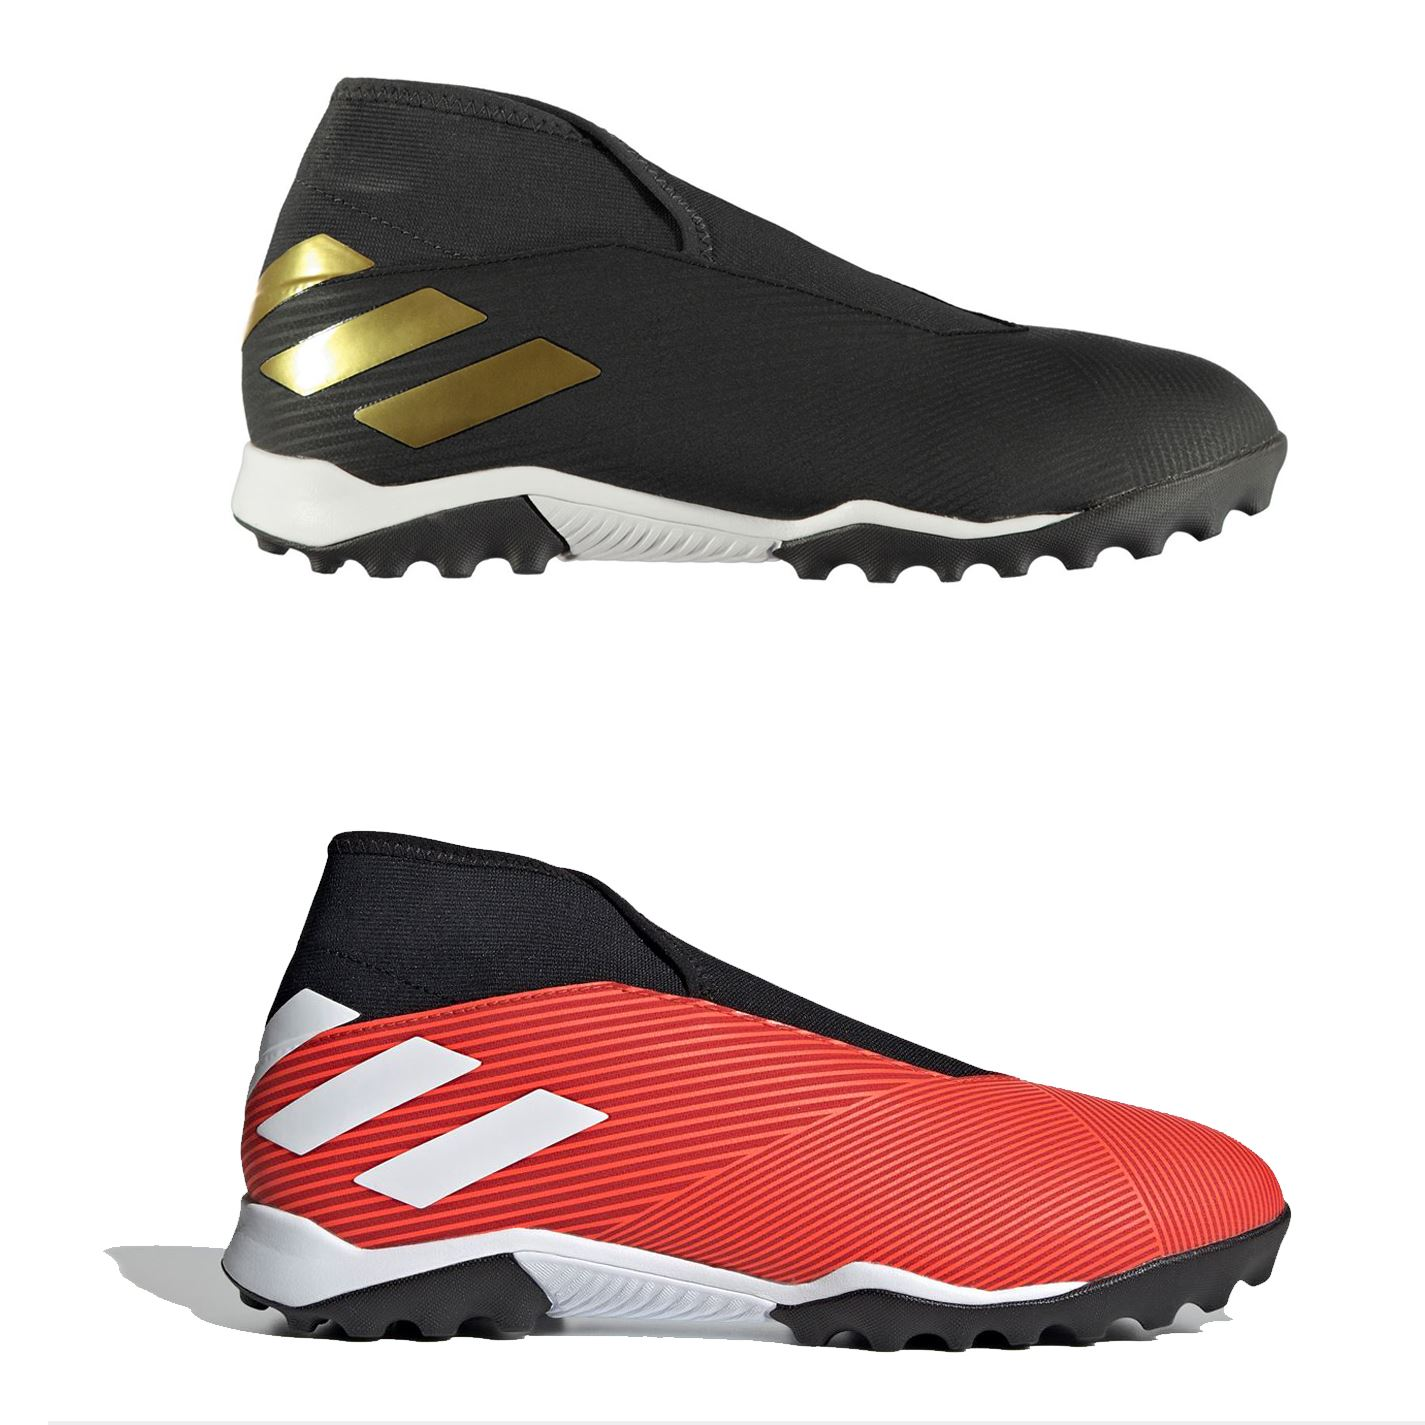 adidas Nemeziz 19.3 Laceless Astro Turf